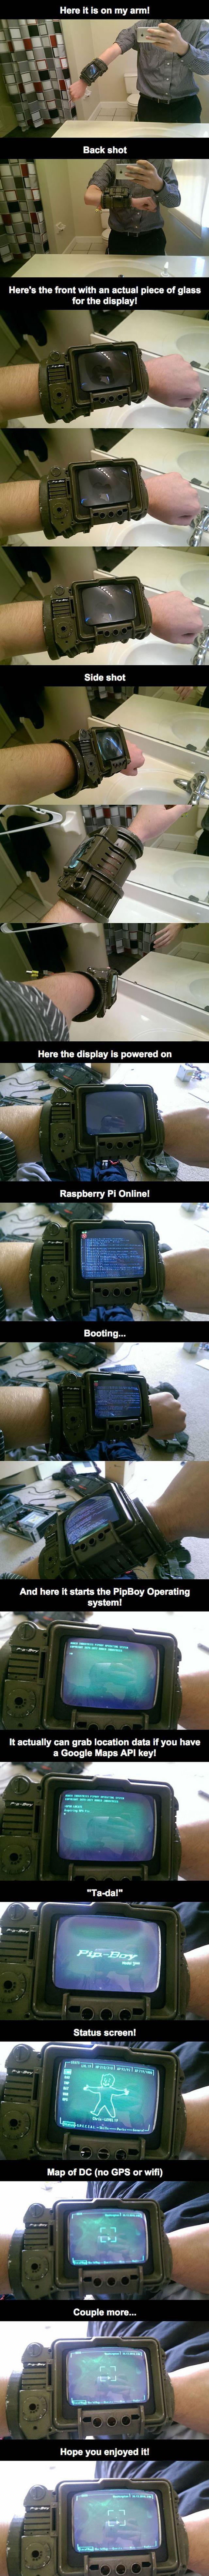 PipBoy 3000A using Rasberry Pi